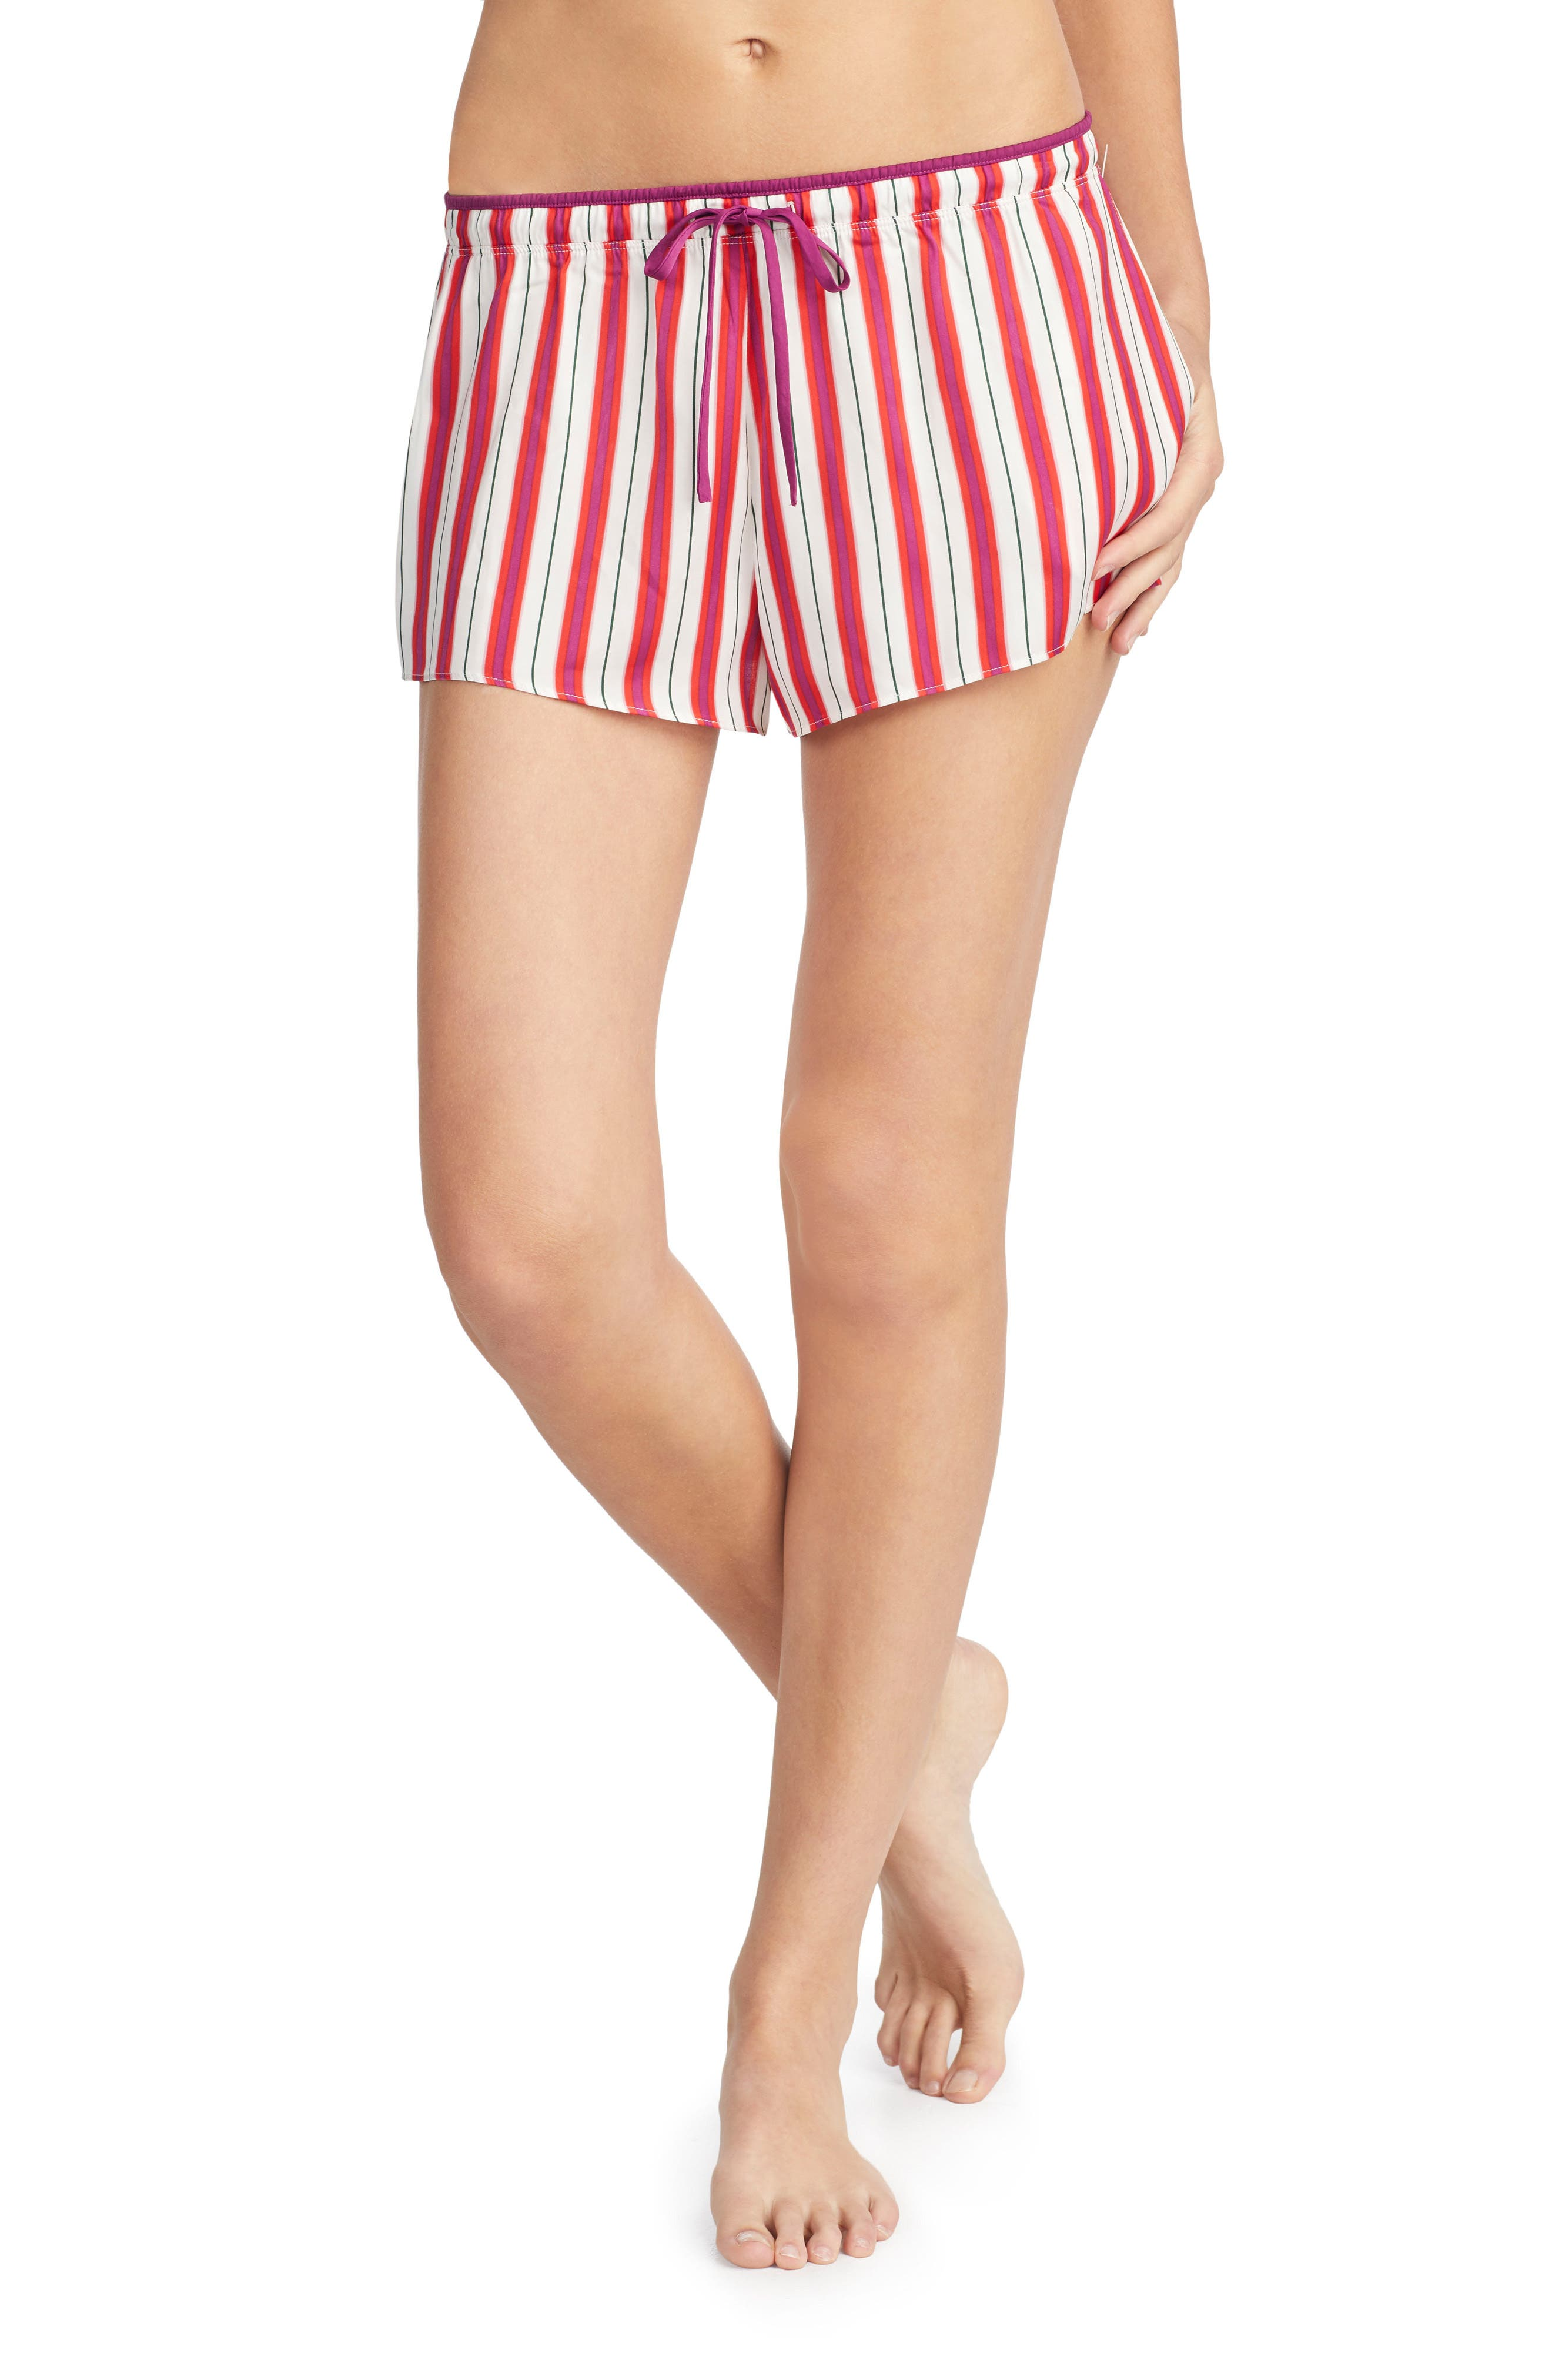 Satin Boxers,                         Main,                         color, Just Nude Stripe